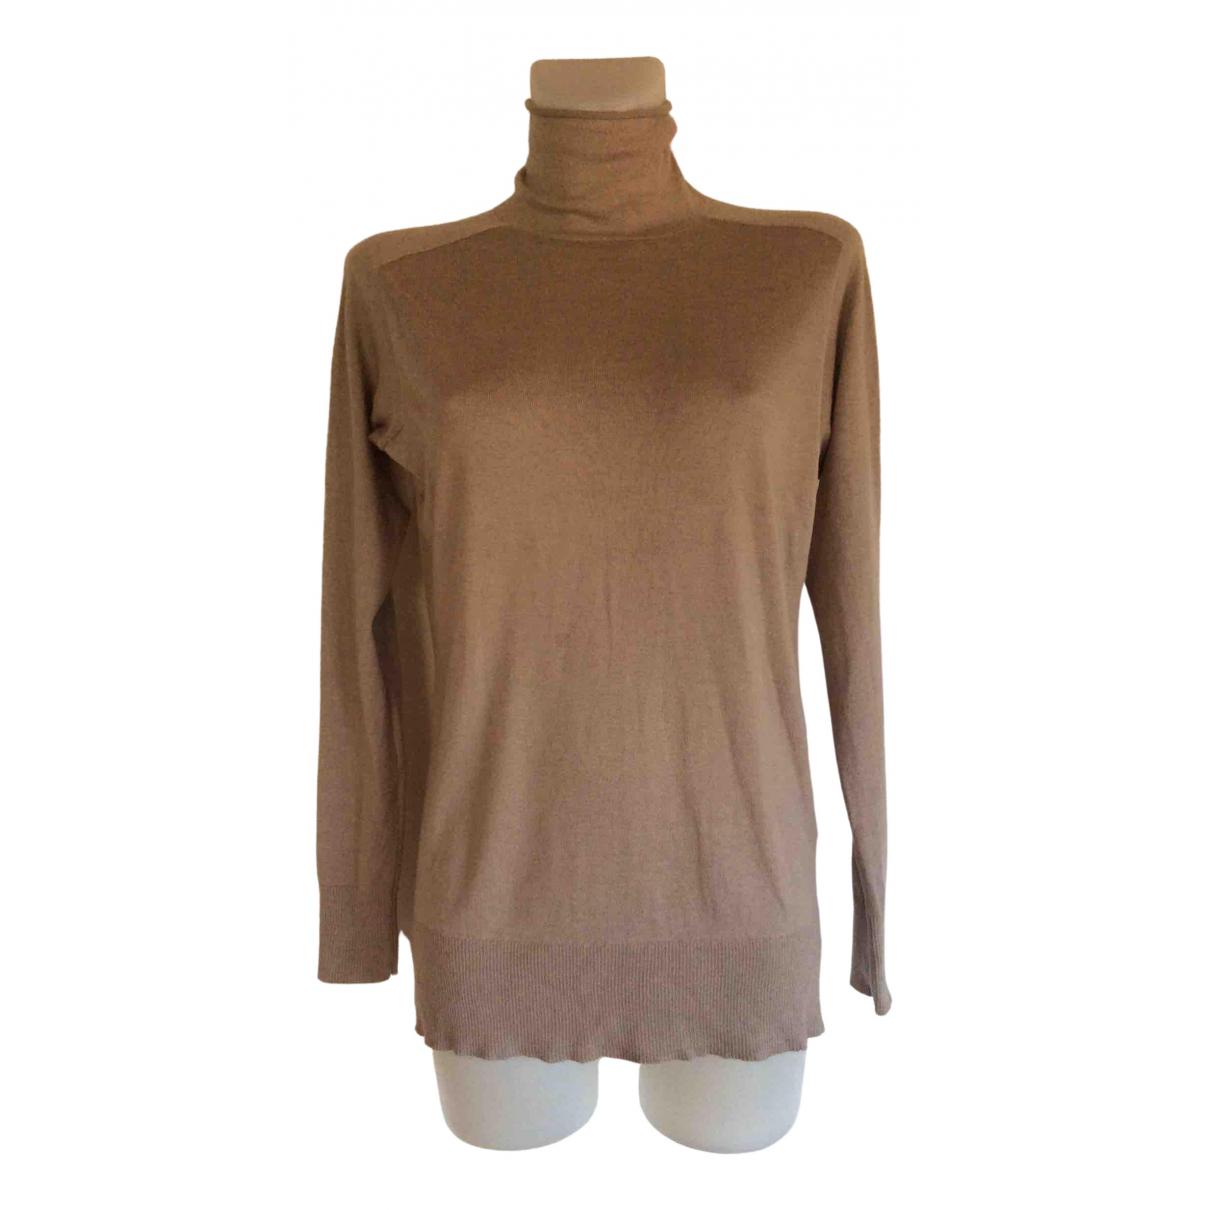 Filippa K - Pull   pour femme en cachemire - beige